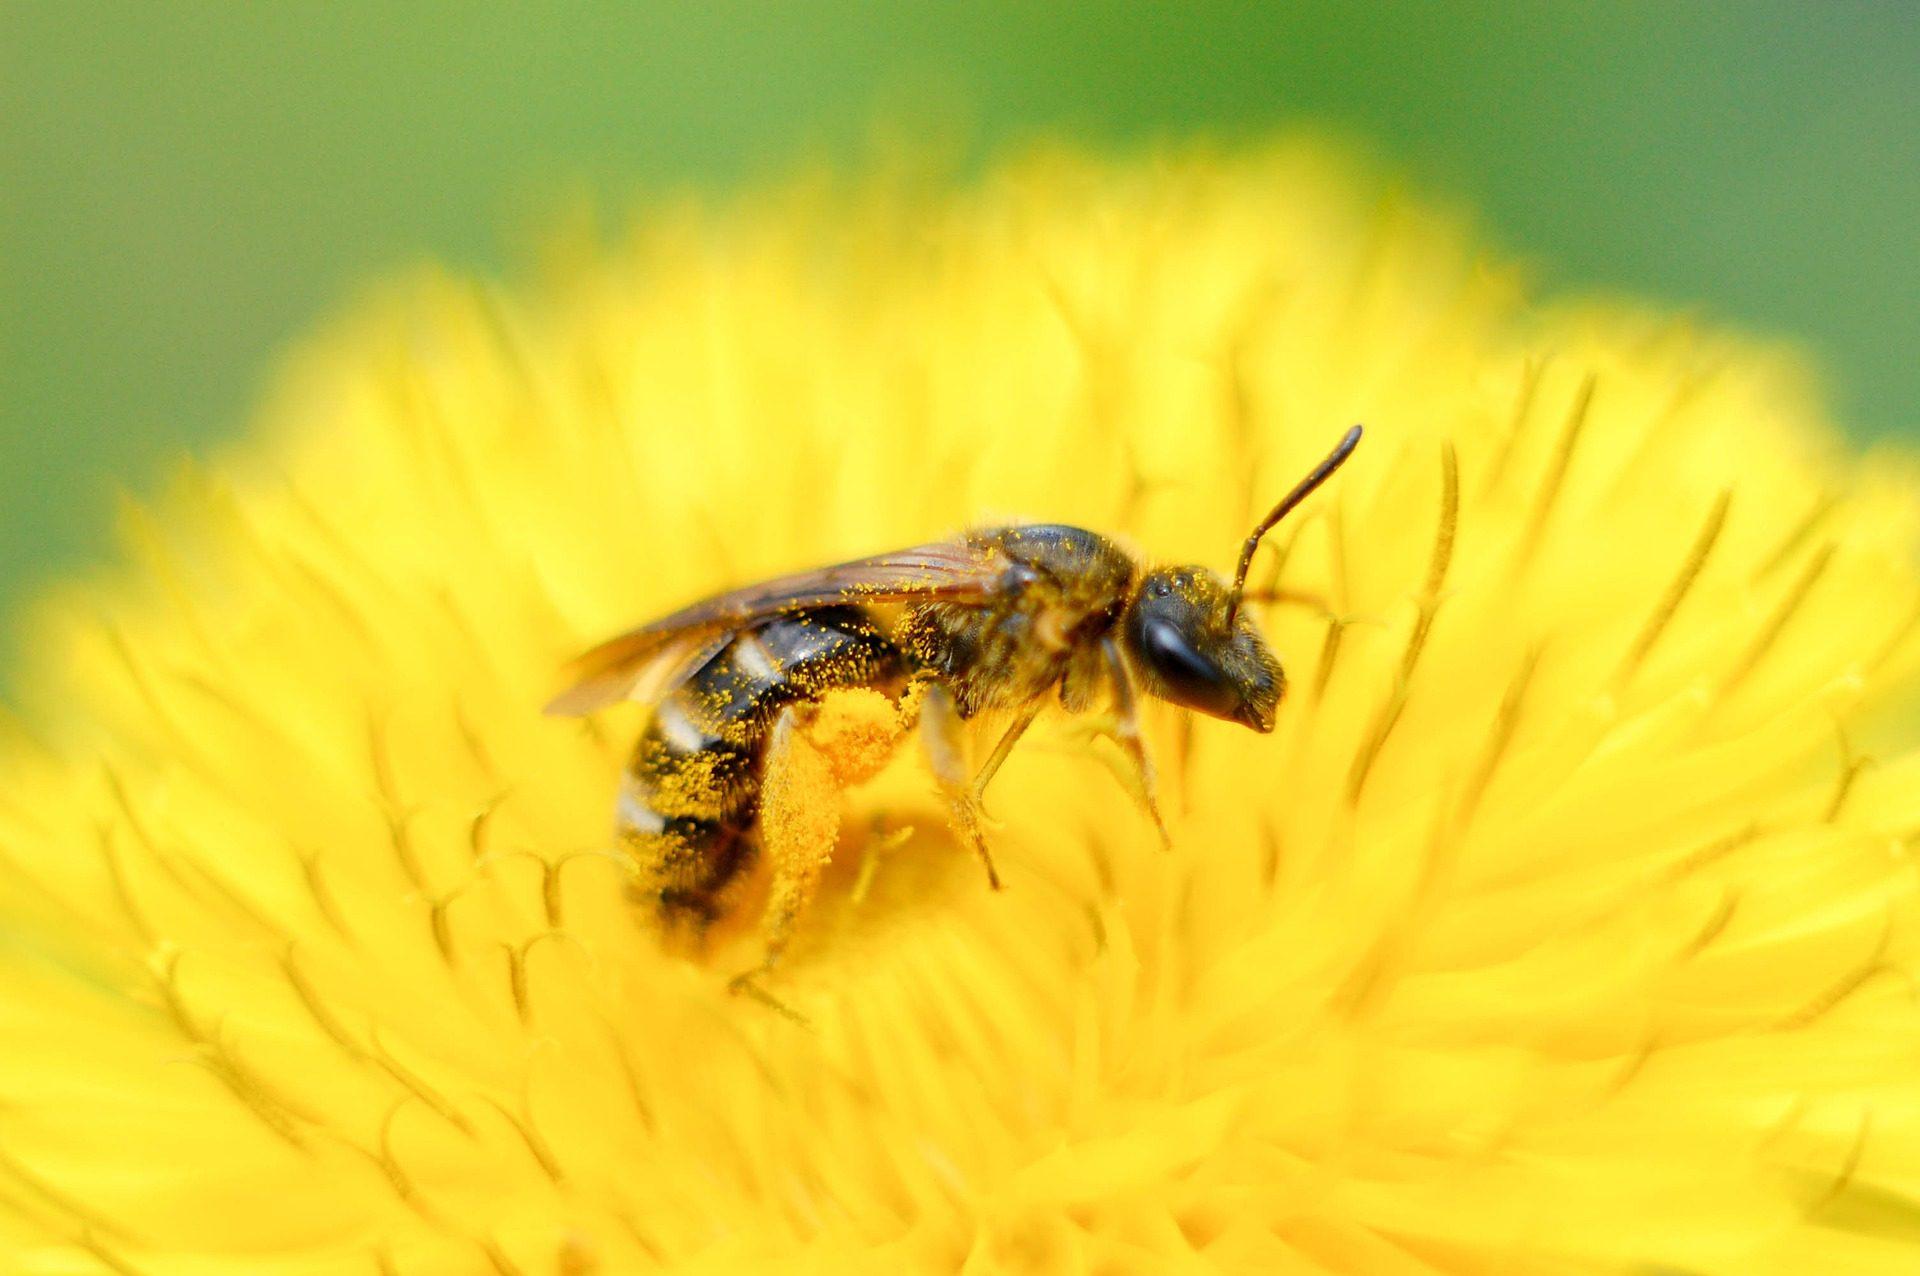 Abelha, WaSP, flor, pólen, inseto - Papéis de parede HD - Professor-falken.com